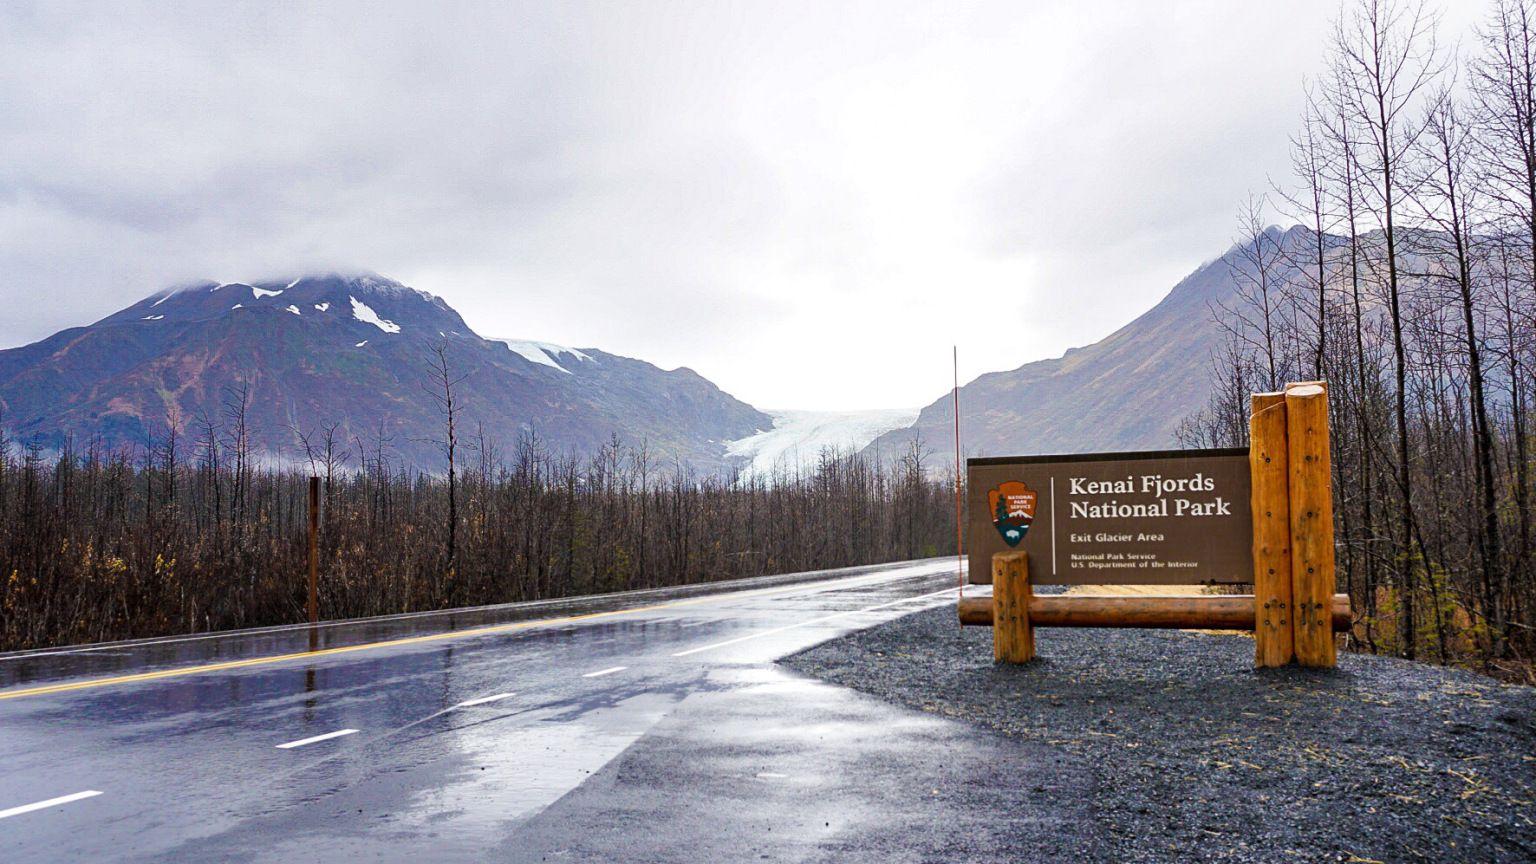 Exit Glacier Seward Alaska Kenai Fjords National Park Kenai Fjords Alaska